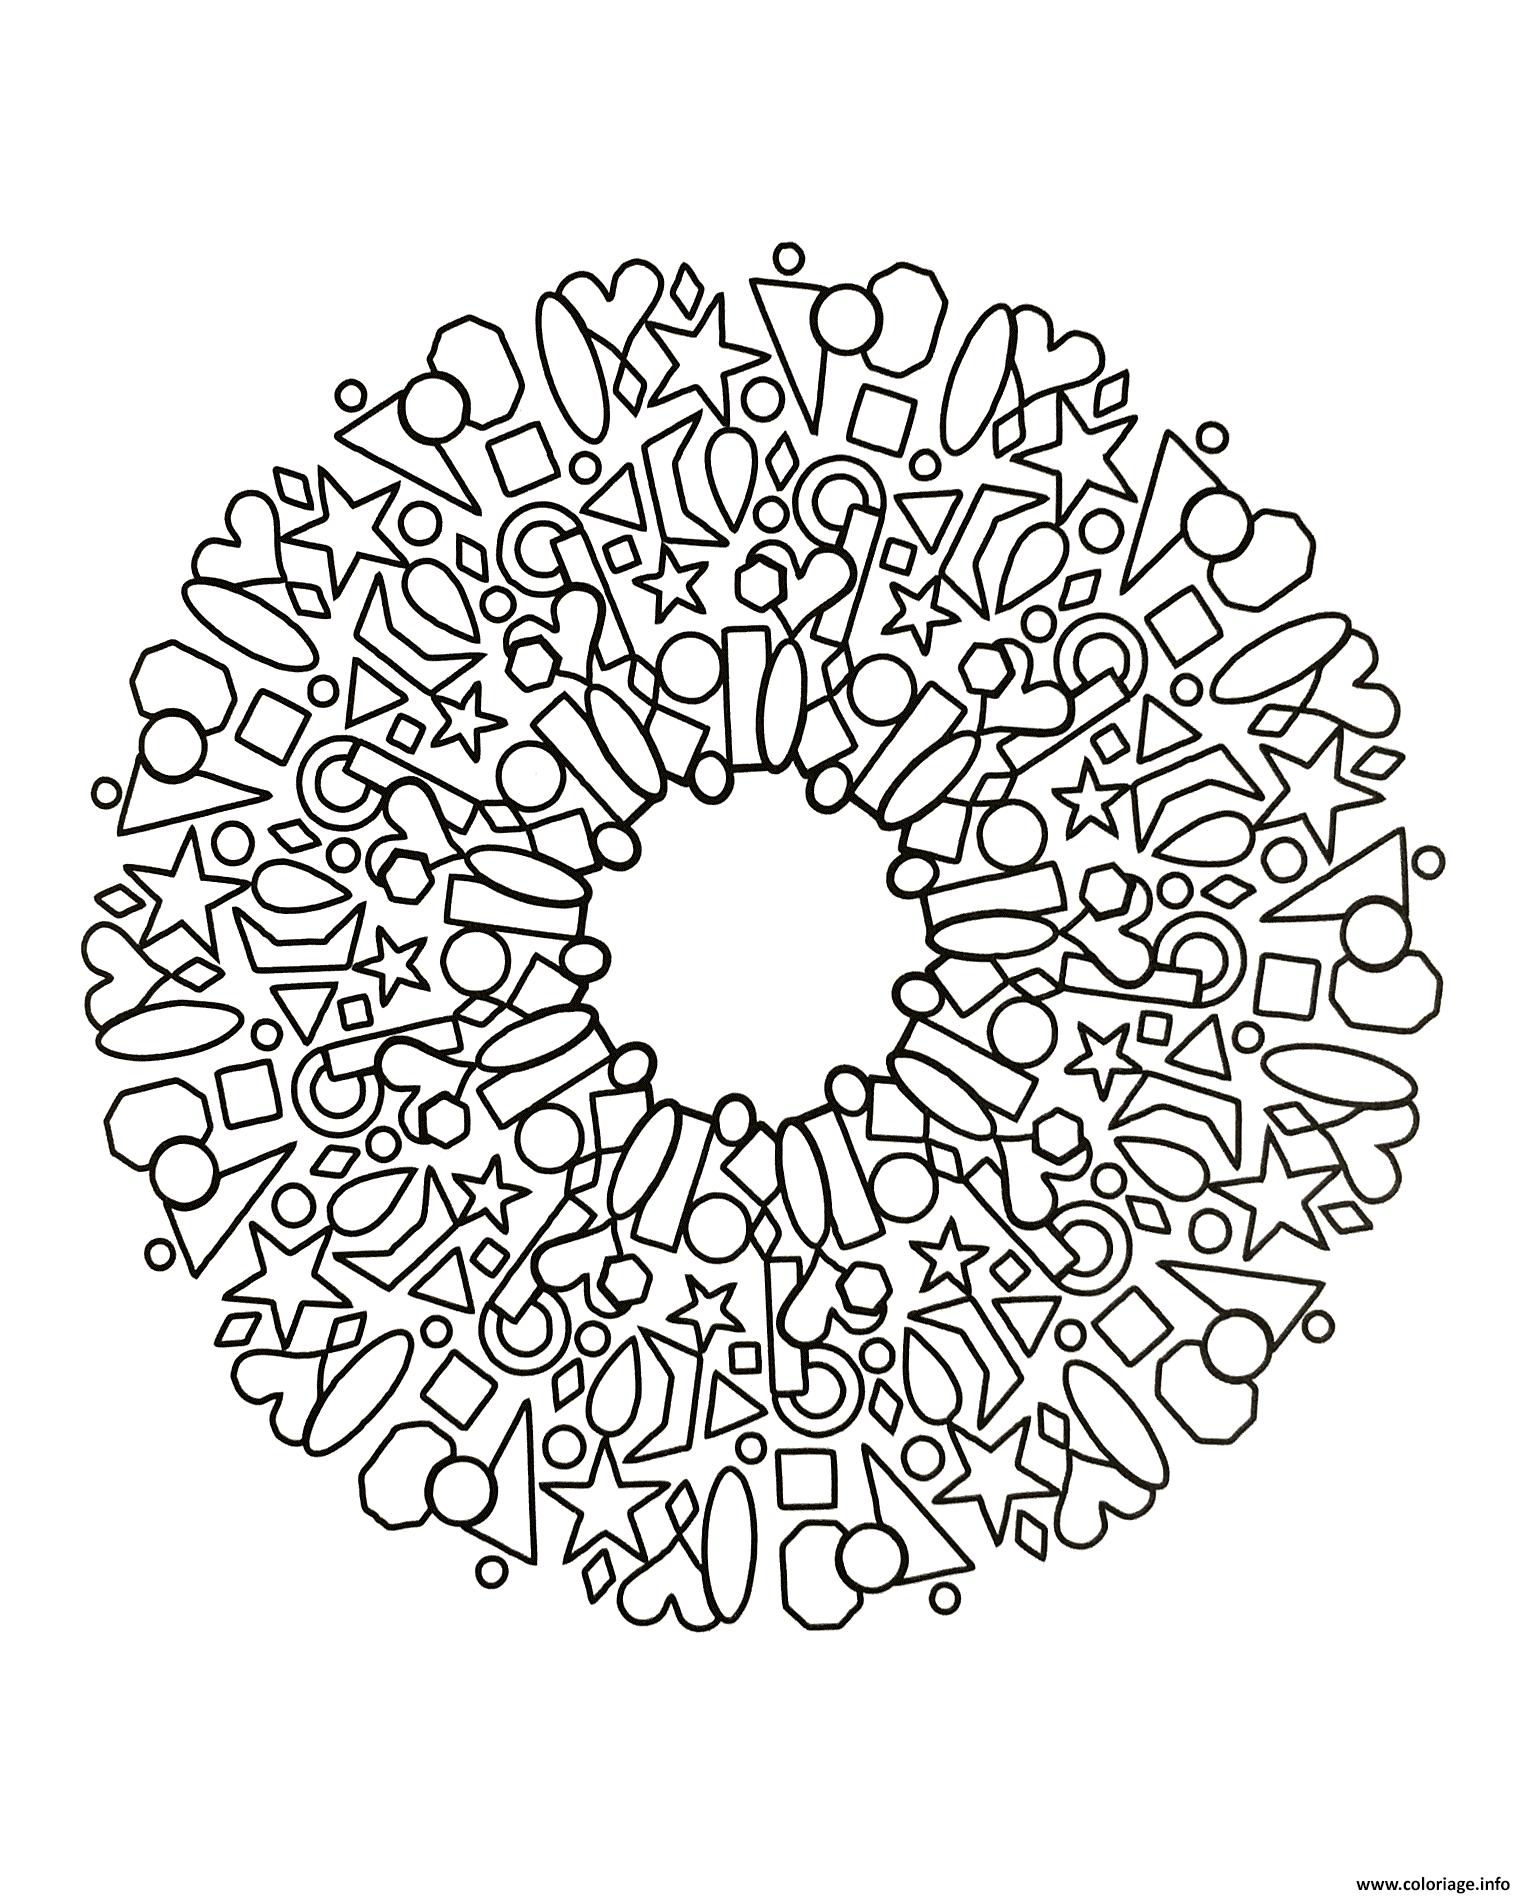 Coloriage mandalas a telecharger gratuitement 24 dessin - Mandala a imprimer gratuit ...